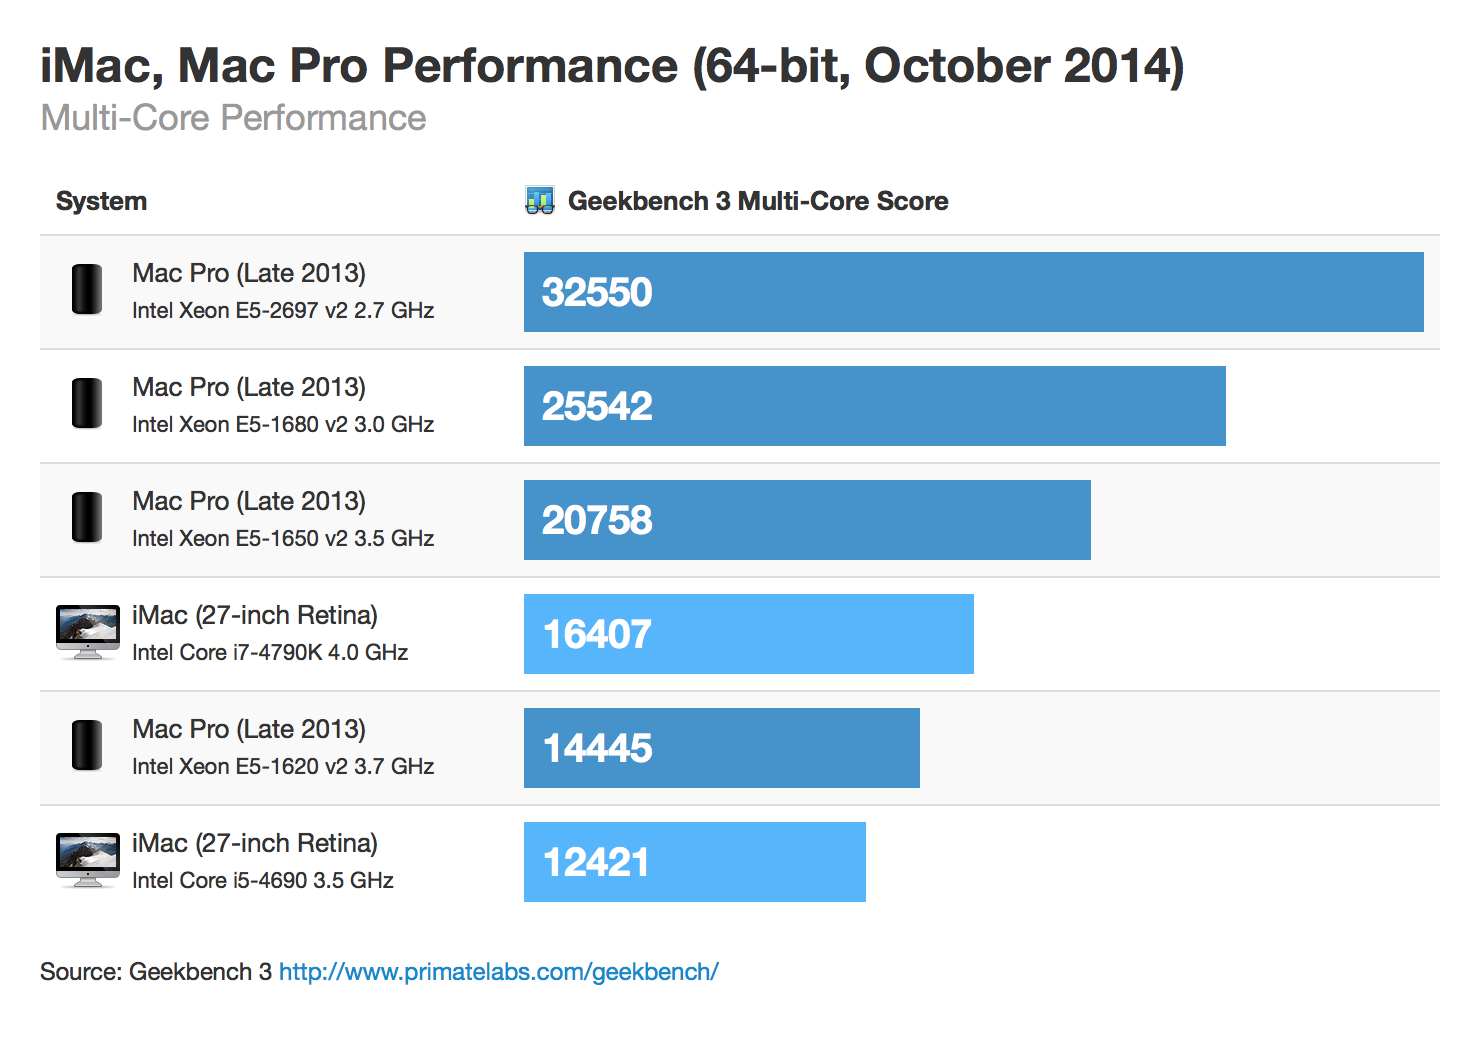 Multi-Core Performance